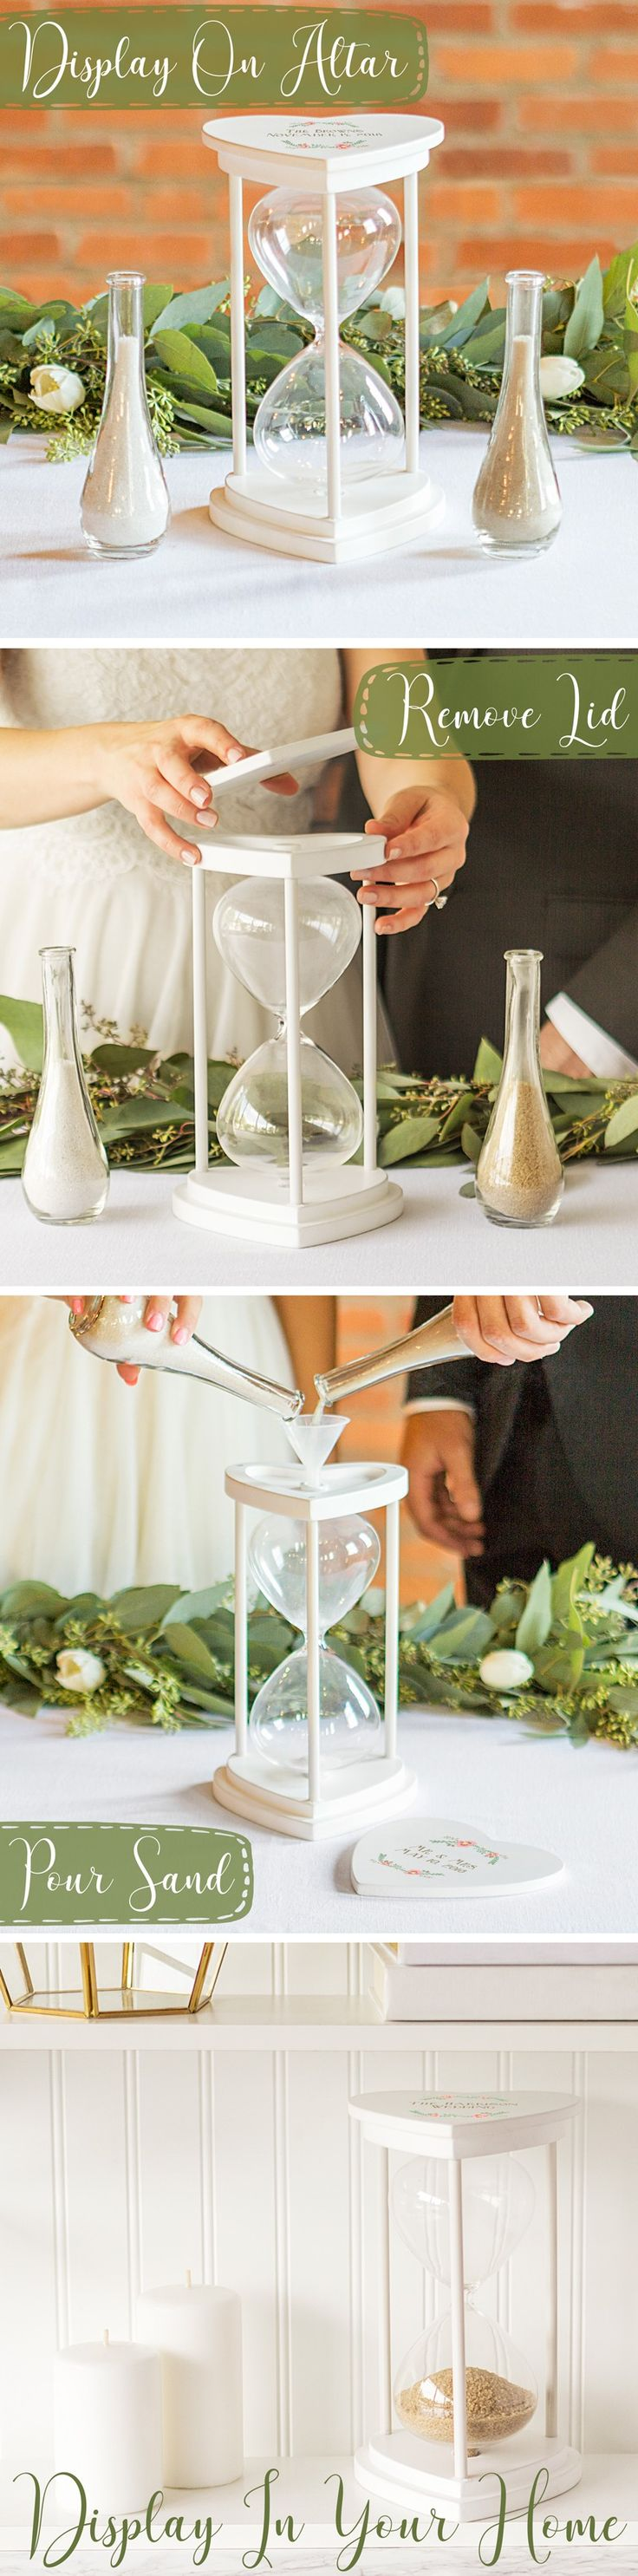 124 best ceremony decoration ideas images on pinterest wedding floral design personalized hourglass wedding unity sand ceremony set reviewsmspy